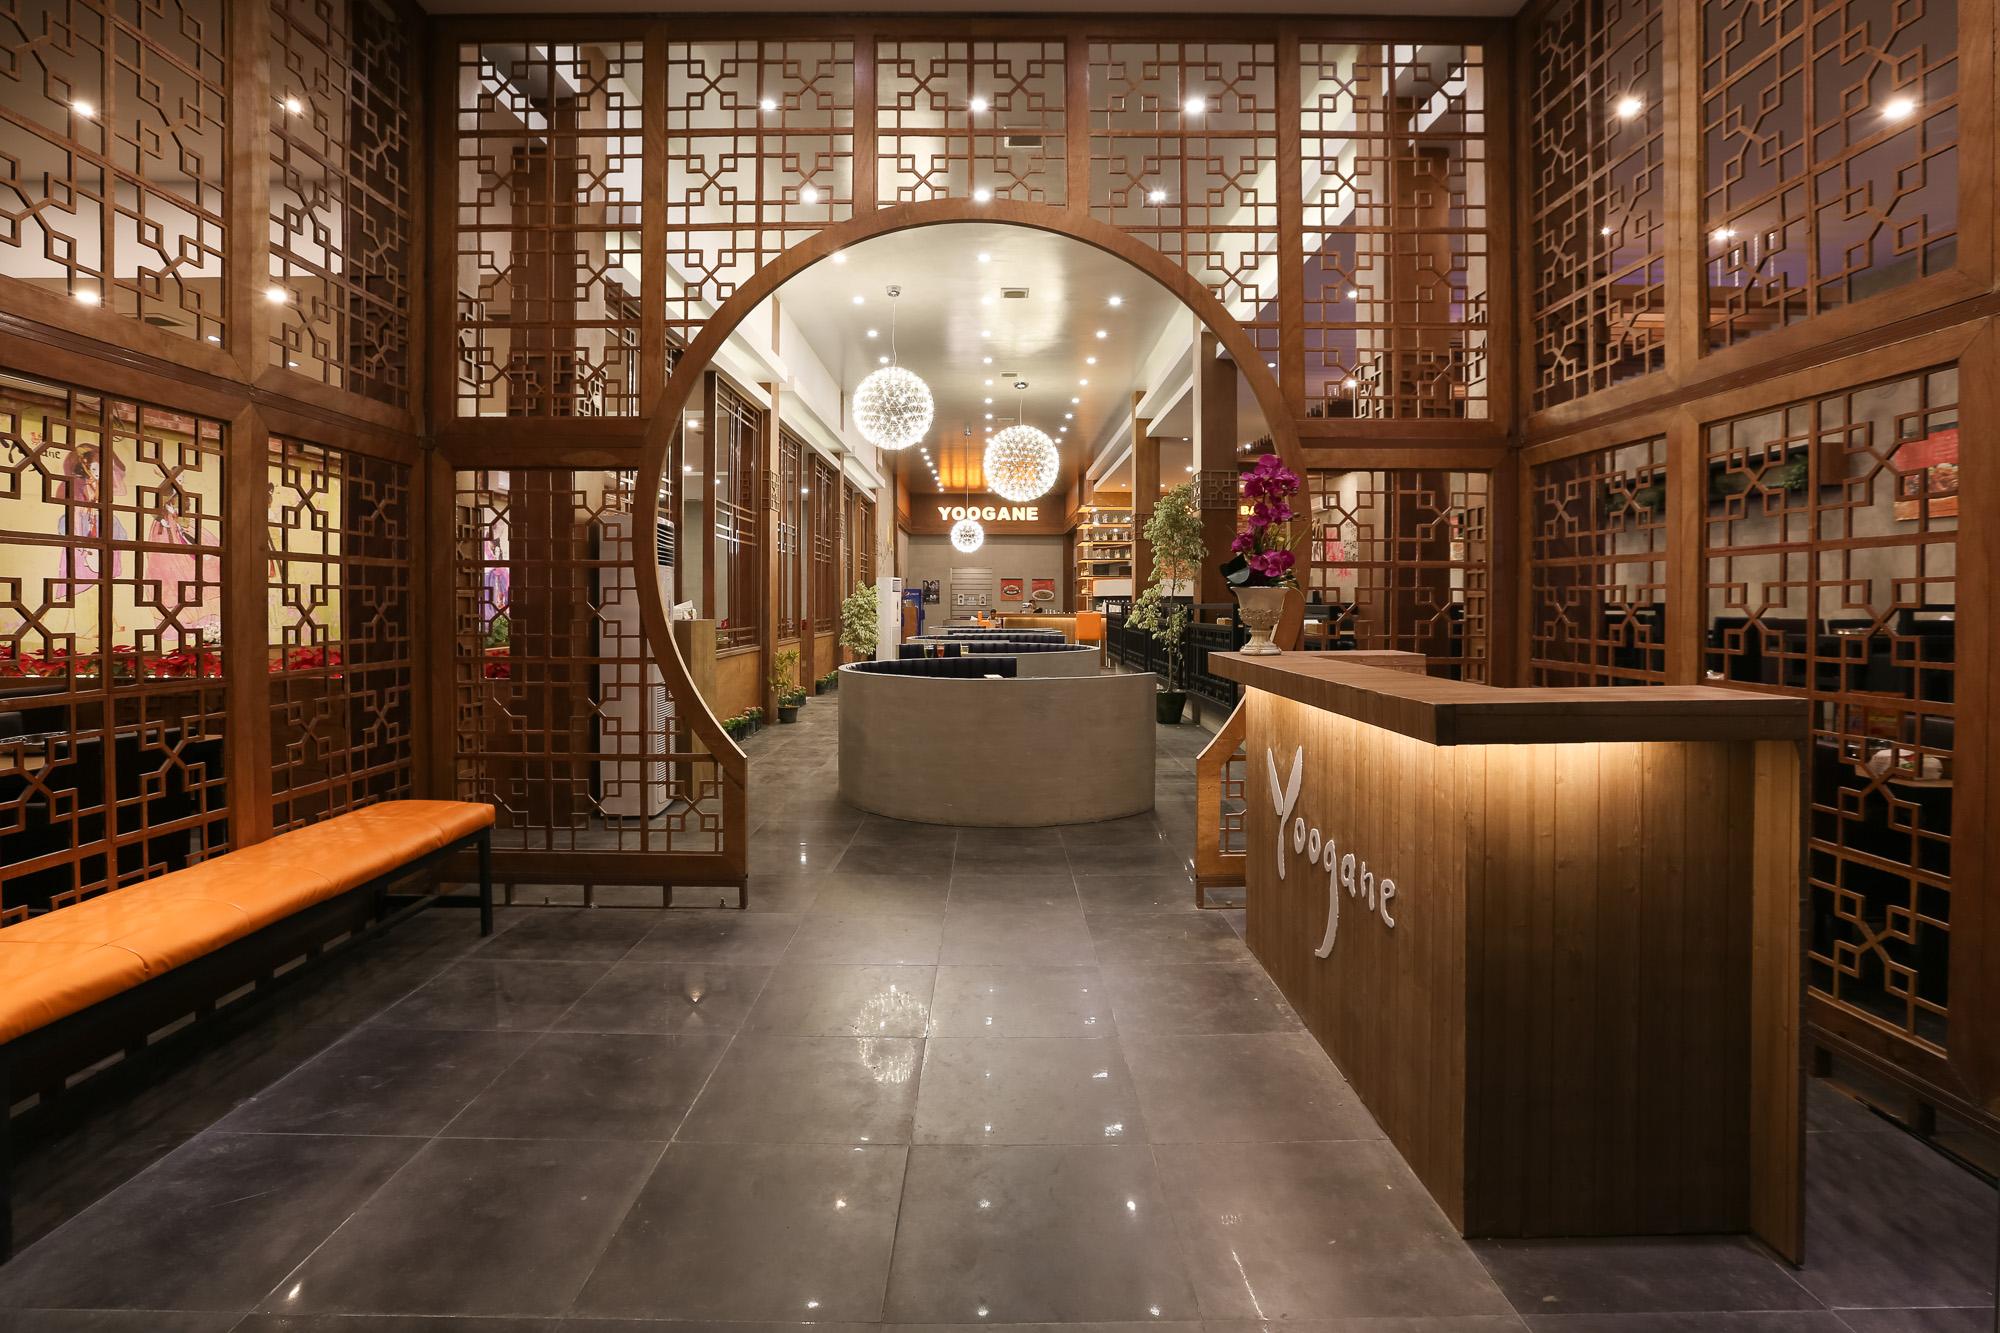 Yoogane Korea Restaurant  Mandalay  Mopa Design